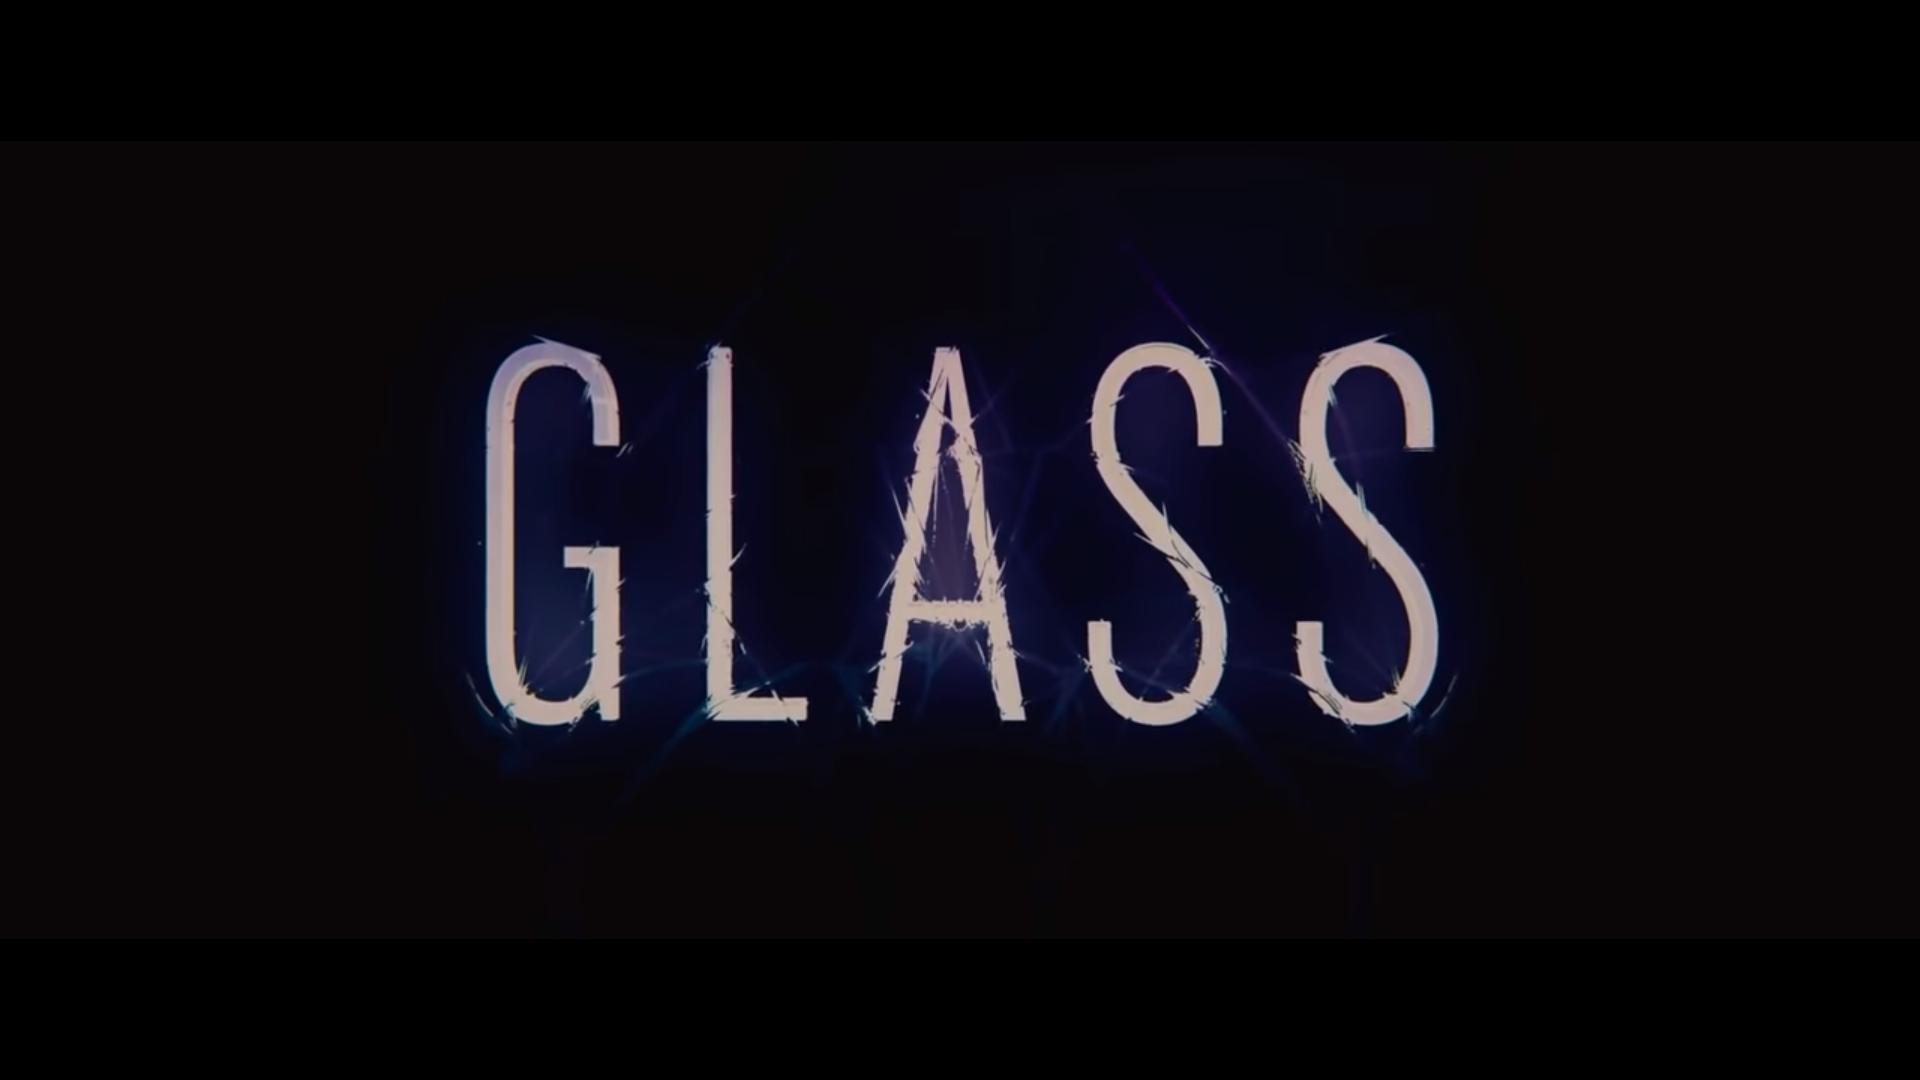 Mira el primer tráiler de la película Glass